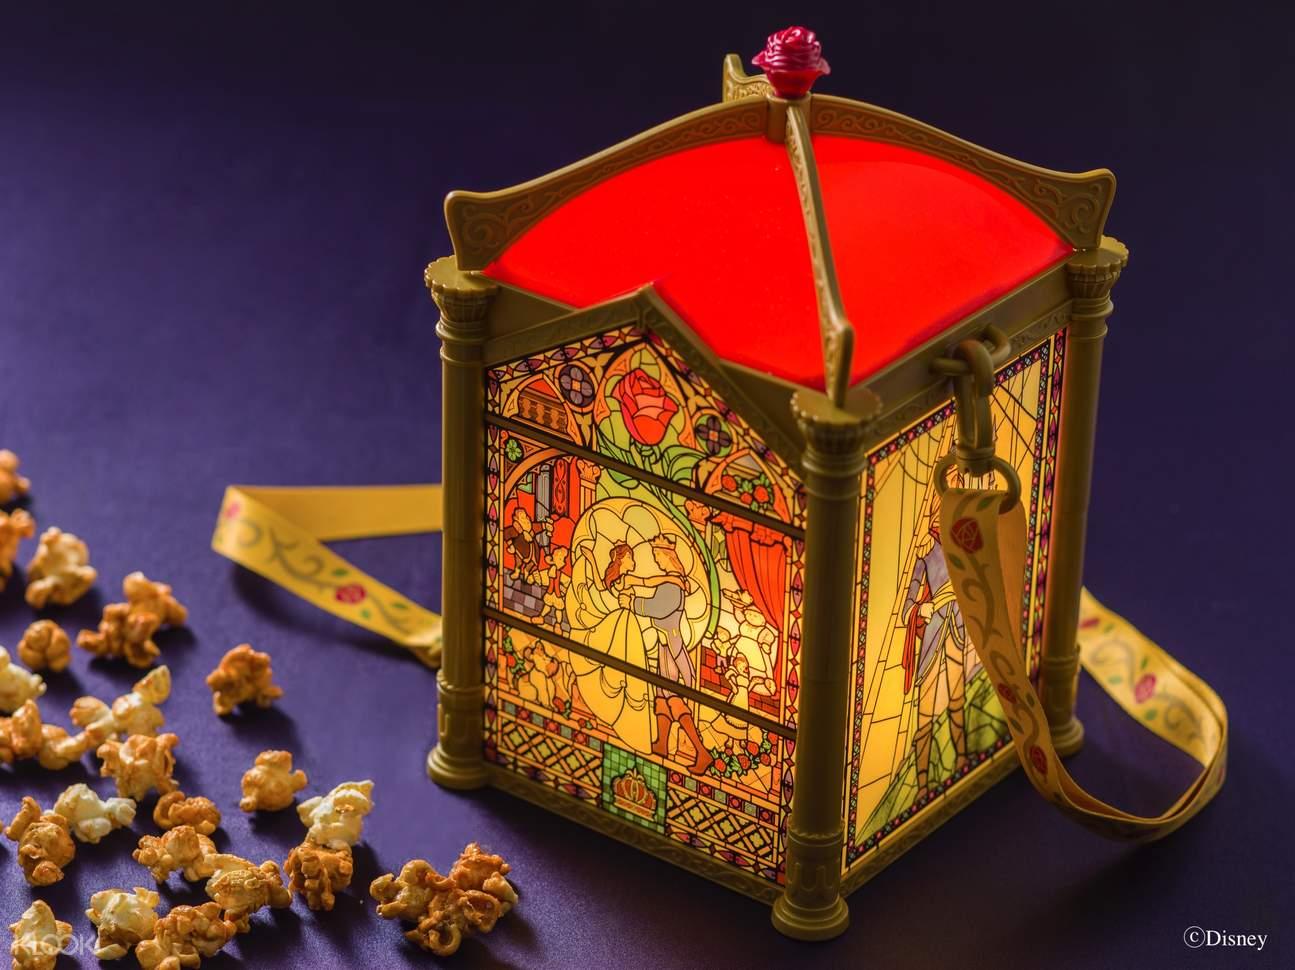 The Beauty and the Beast popcorn bucket